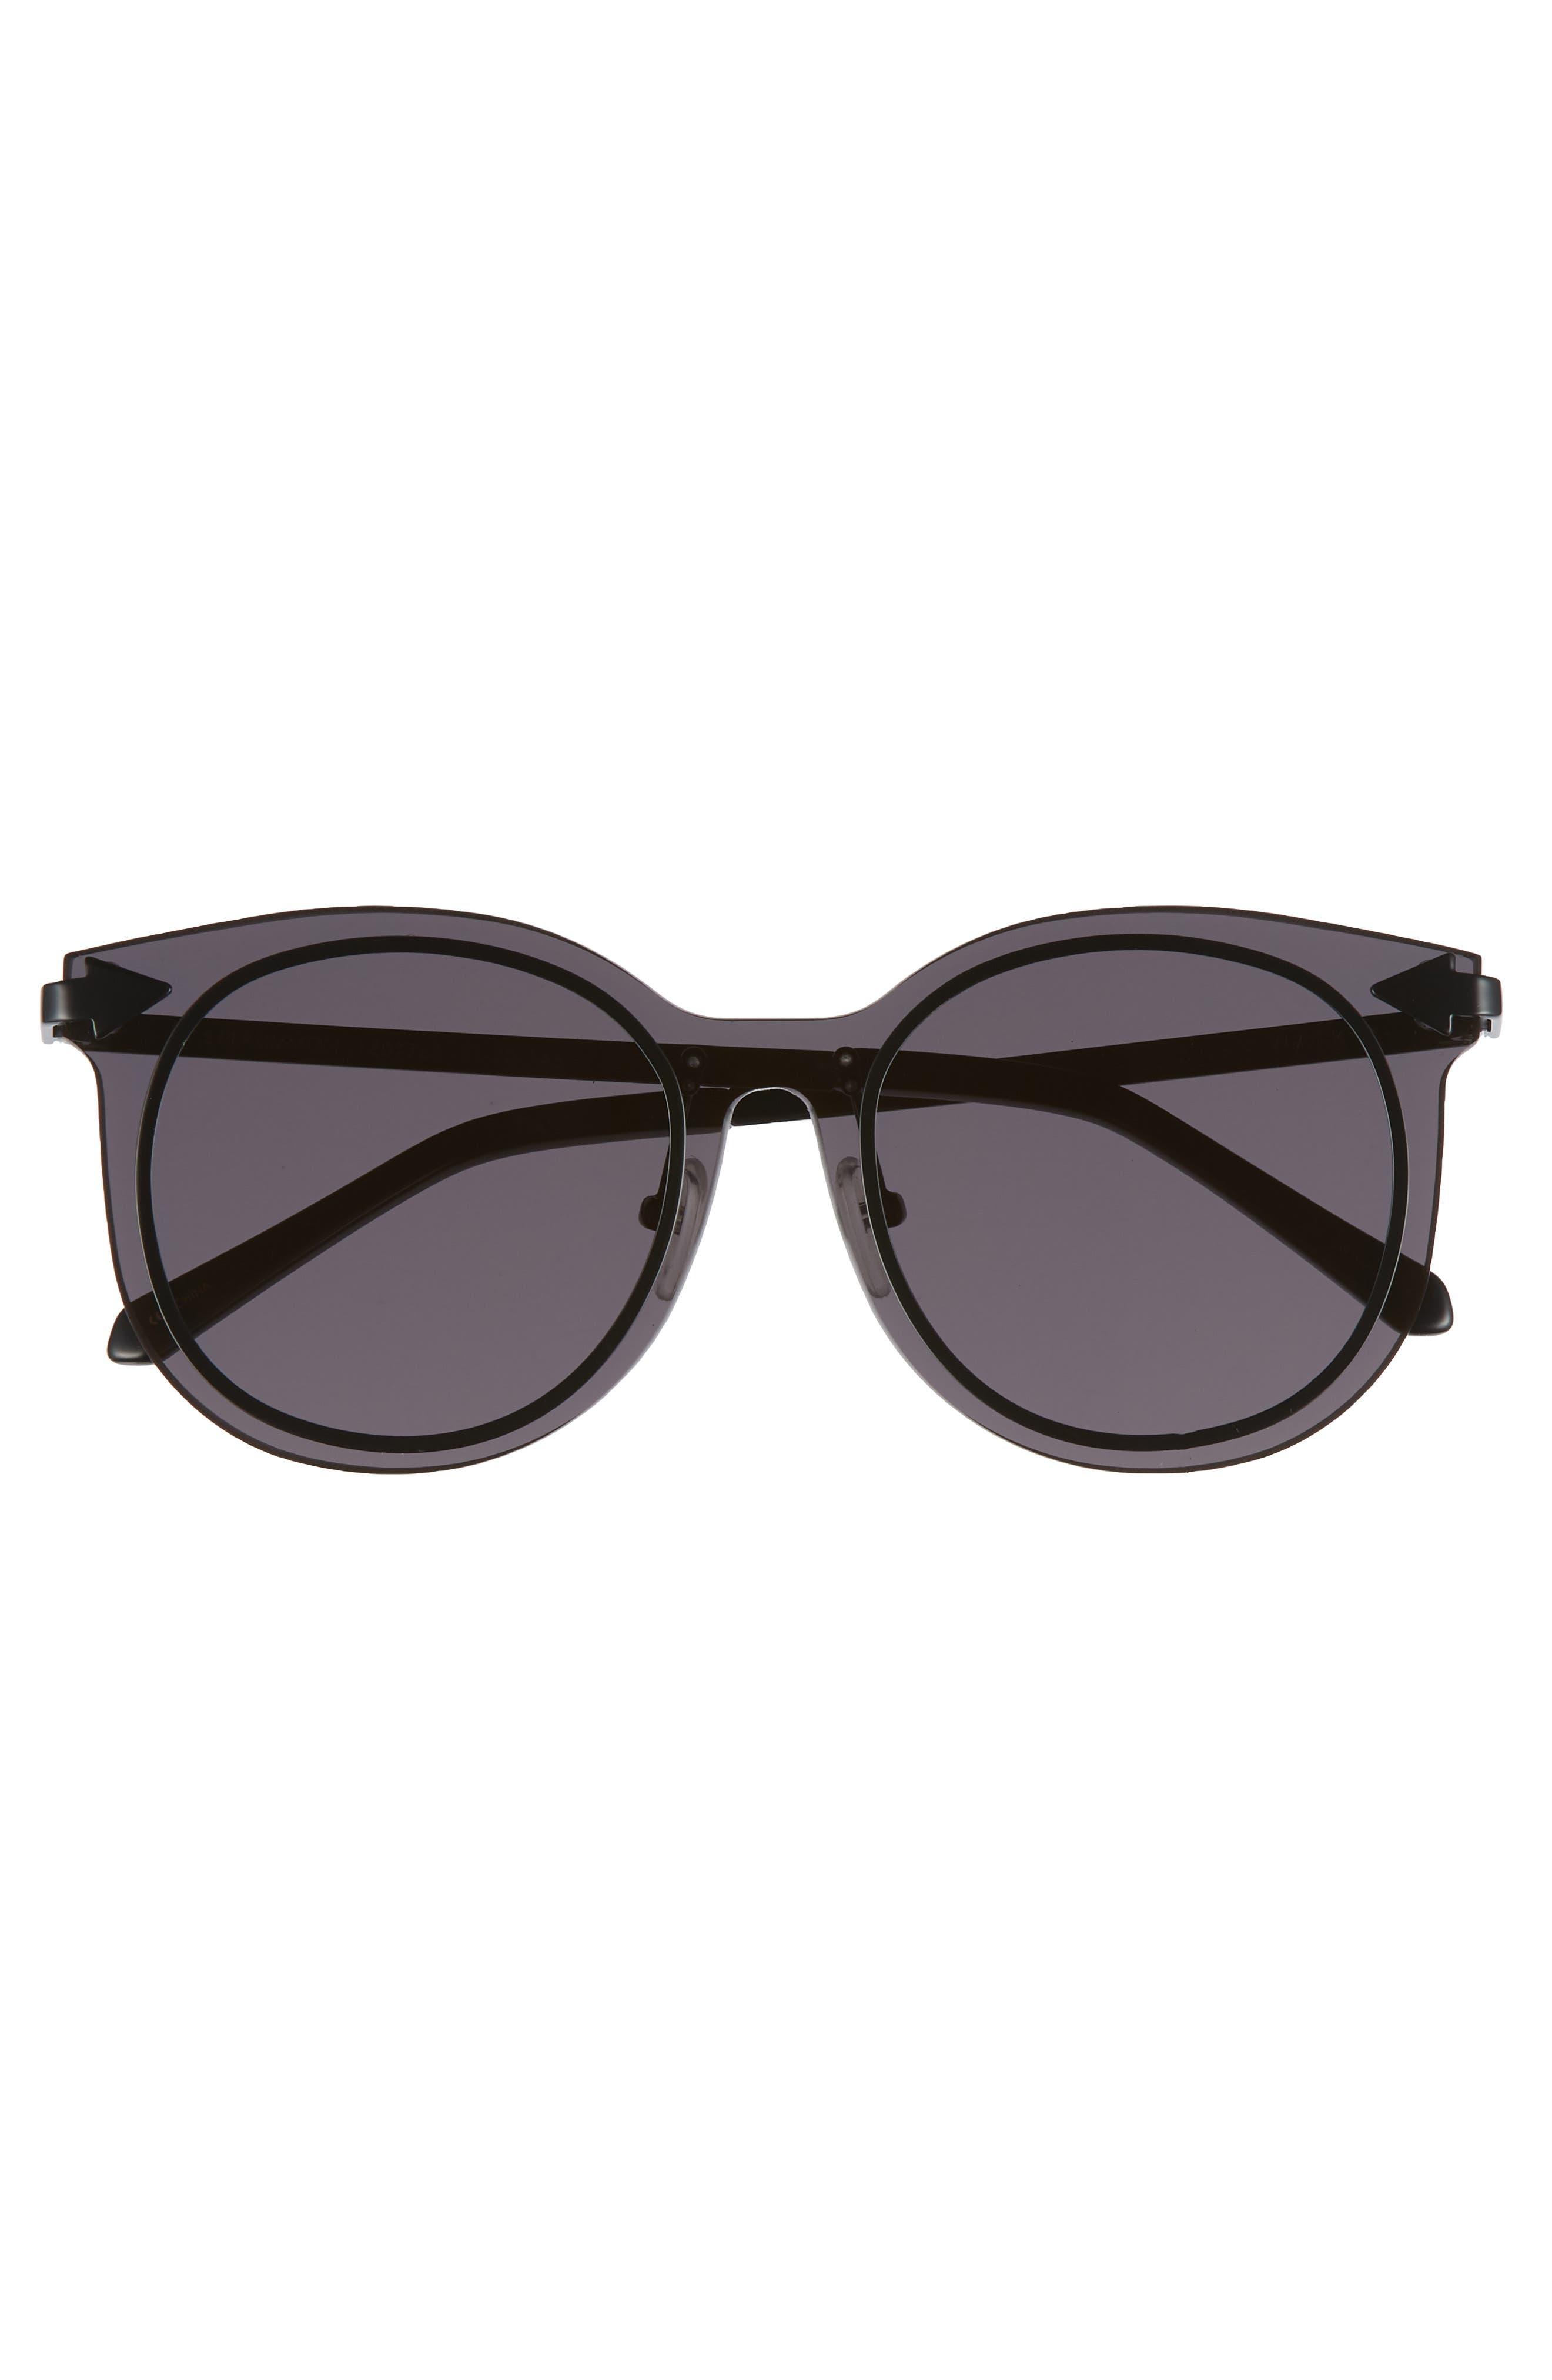 Miss Persimmon 51mm Sunglasses,                             Alternate thumbnail 3, color,                             Black